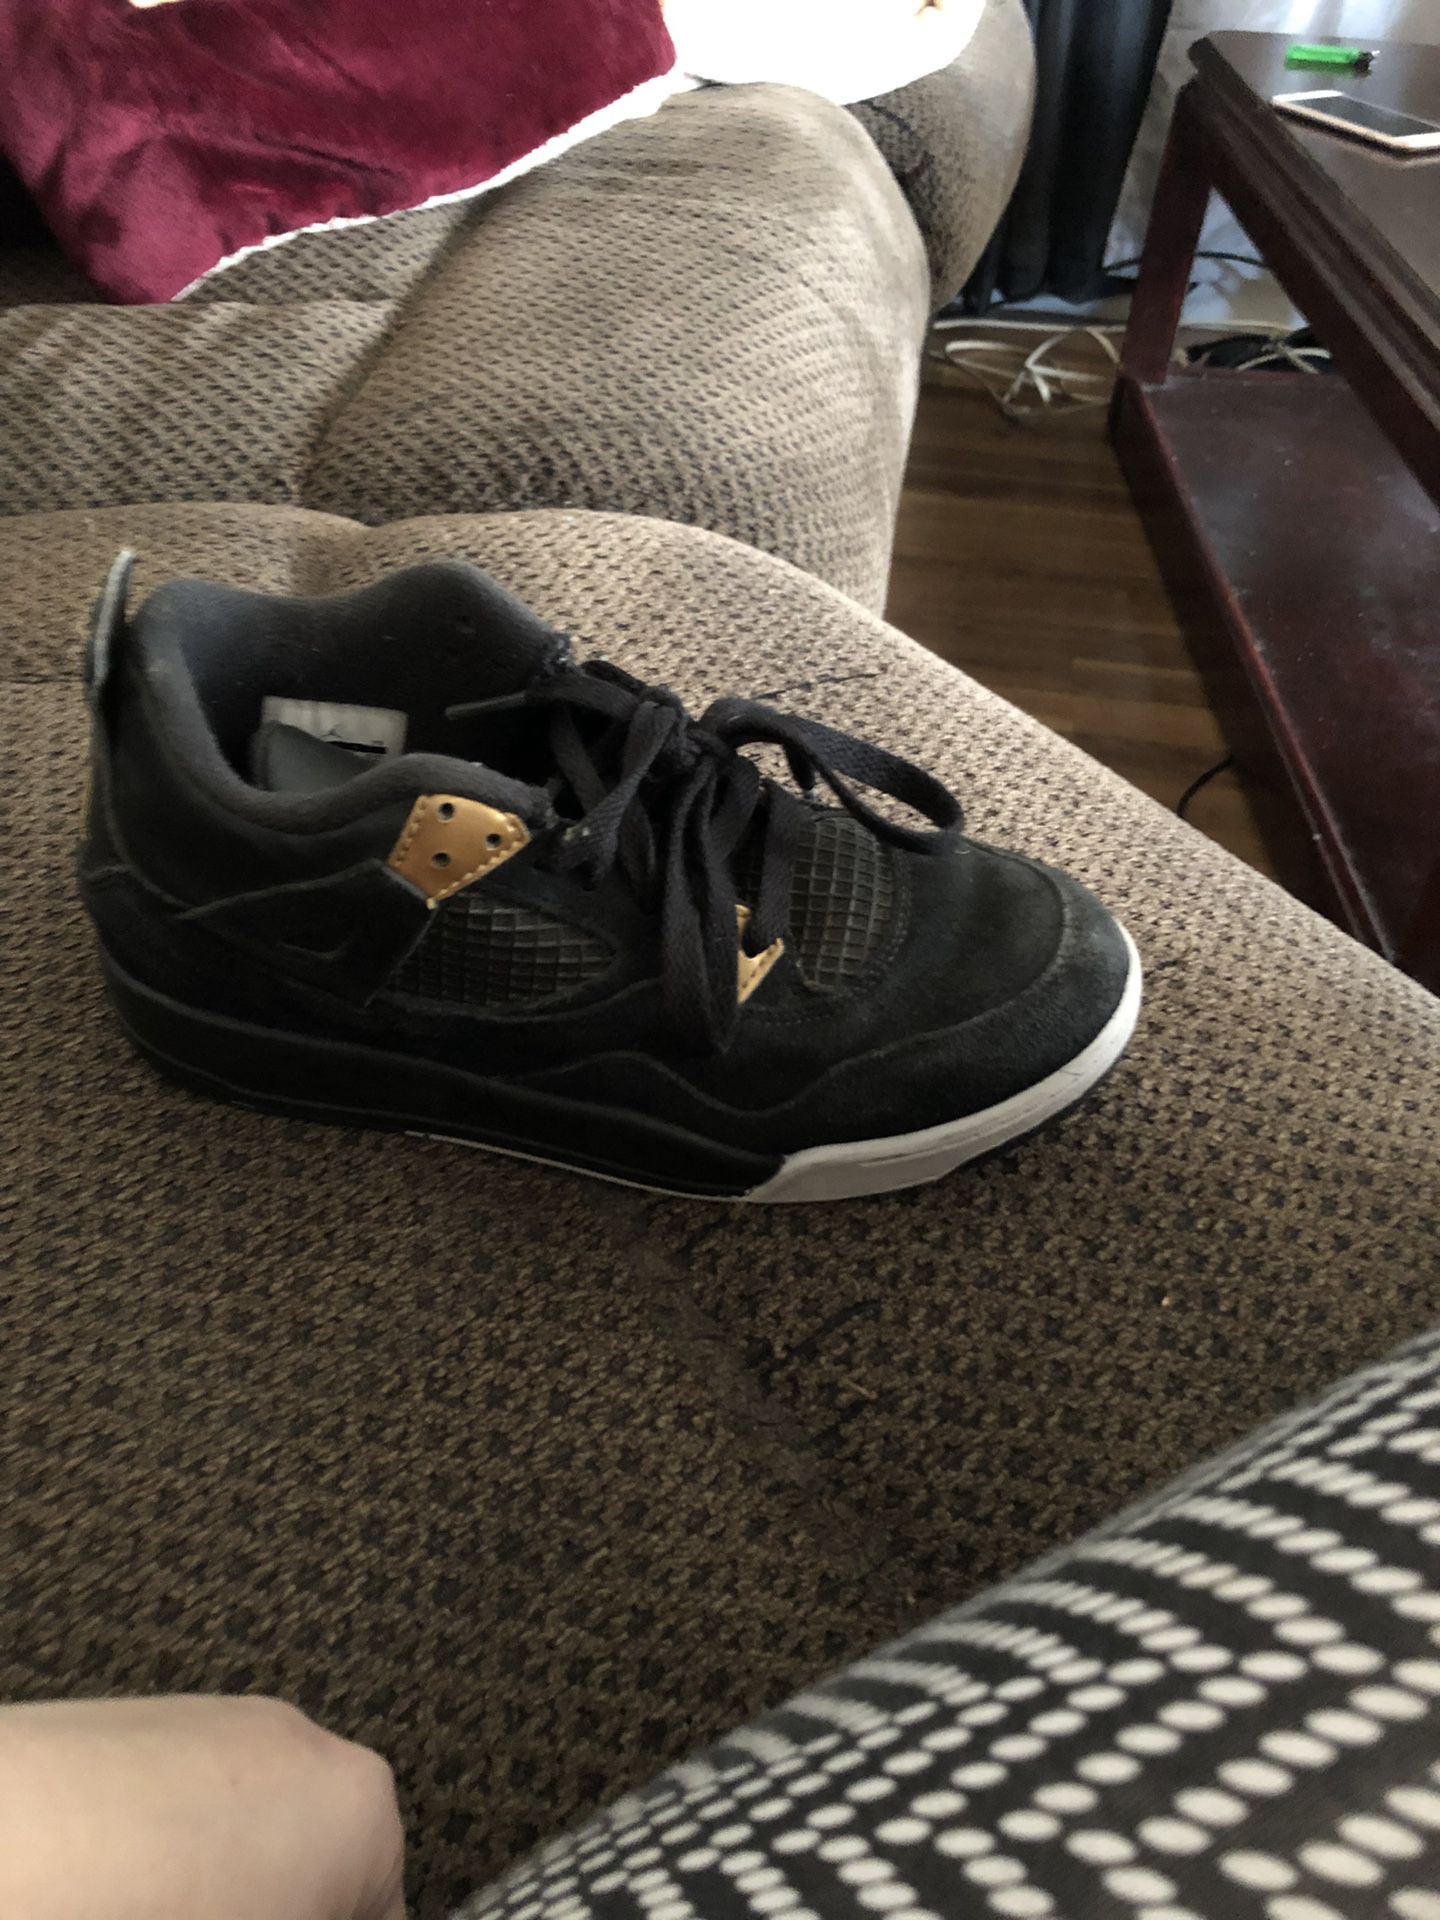 Jordan 4 Royalty's